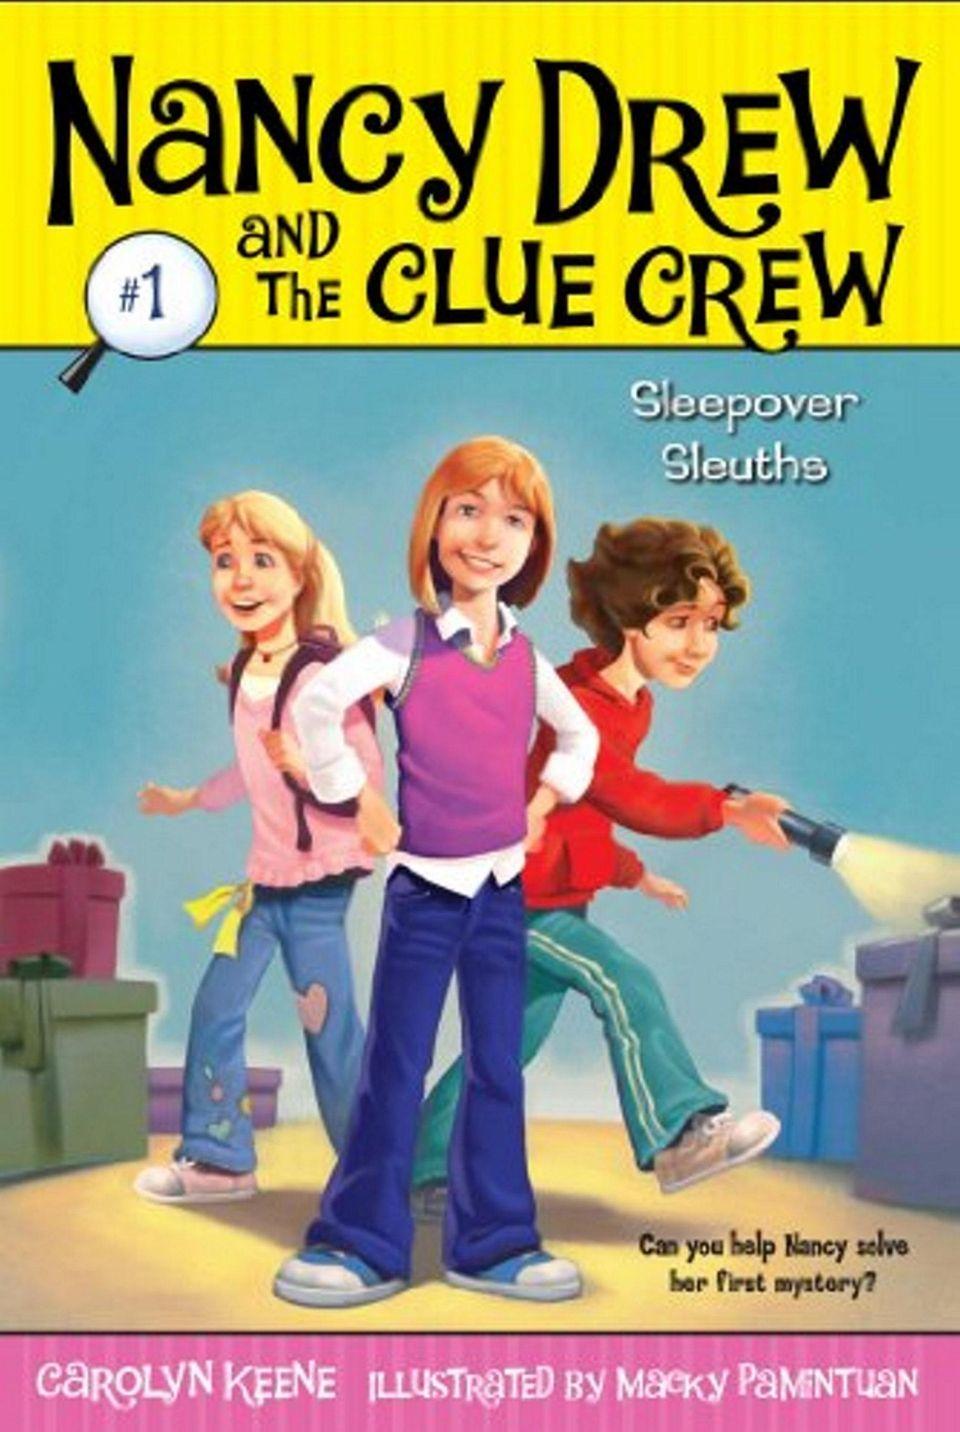 Nancy Drew and the Clue Crew Sleepover Sleuths